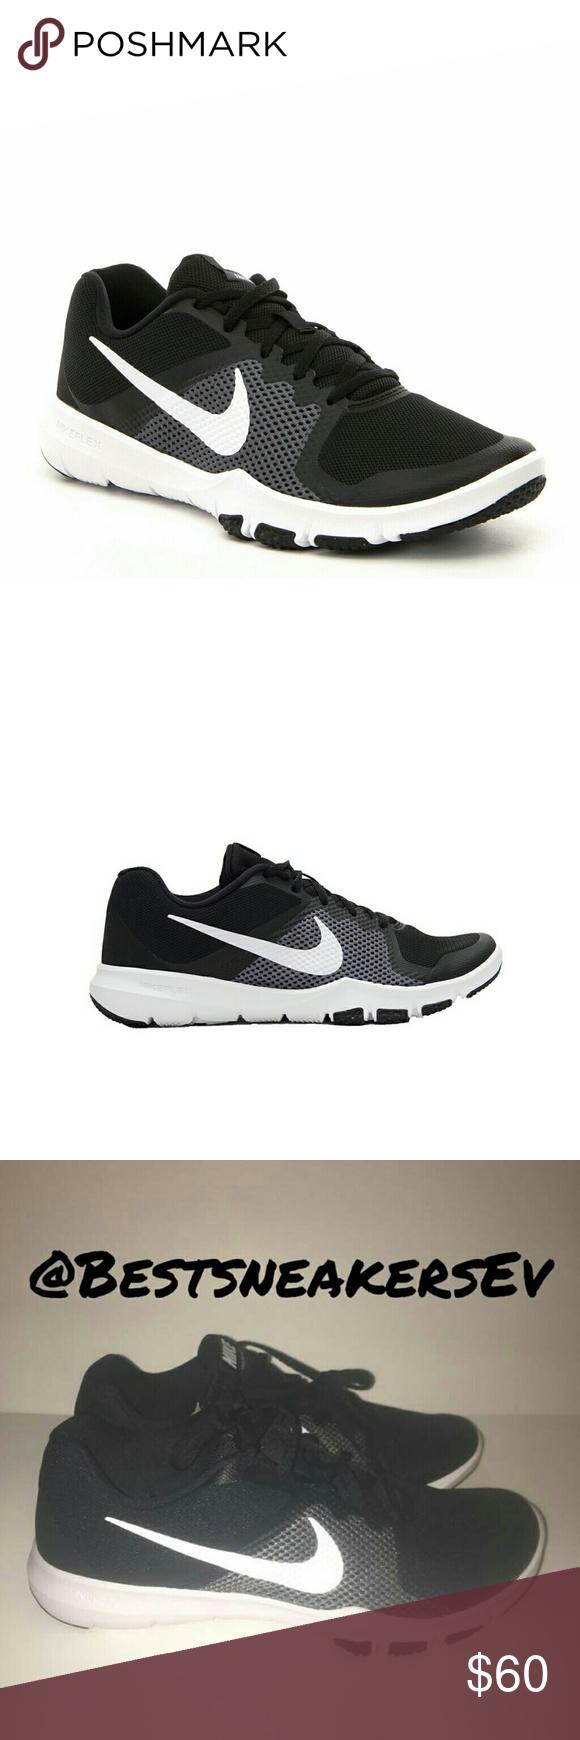 754222a75bf6e Nike flex control 4e nwt